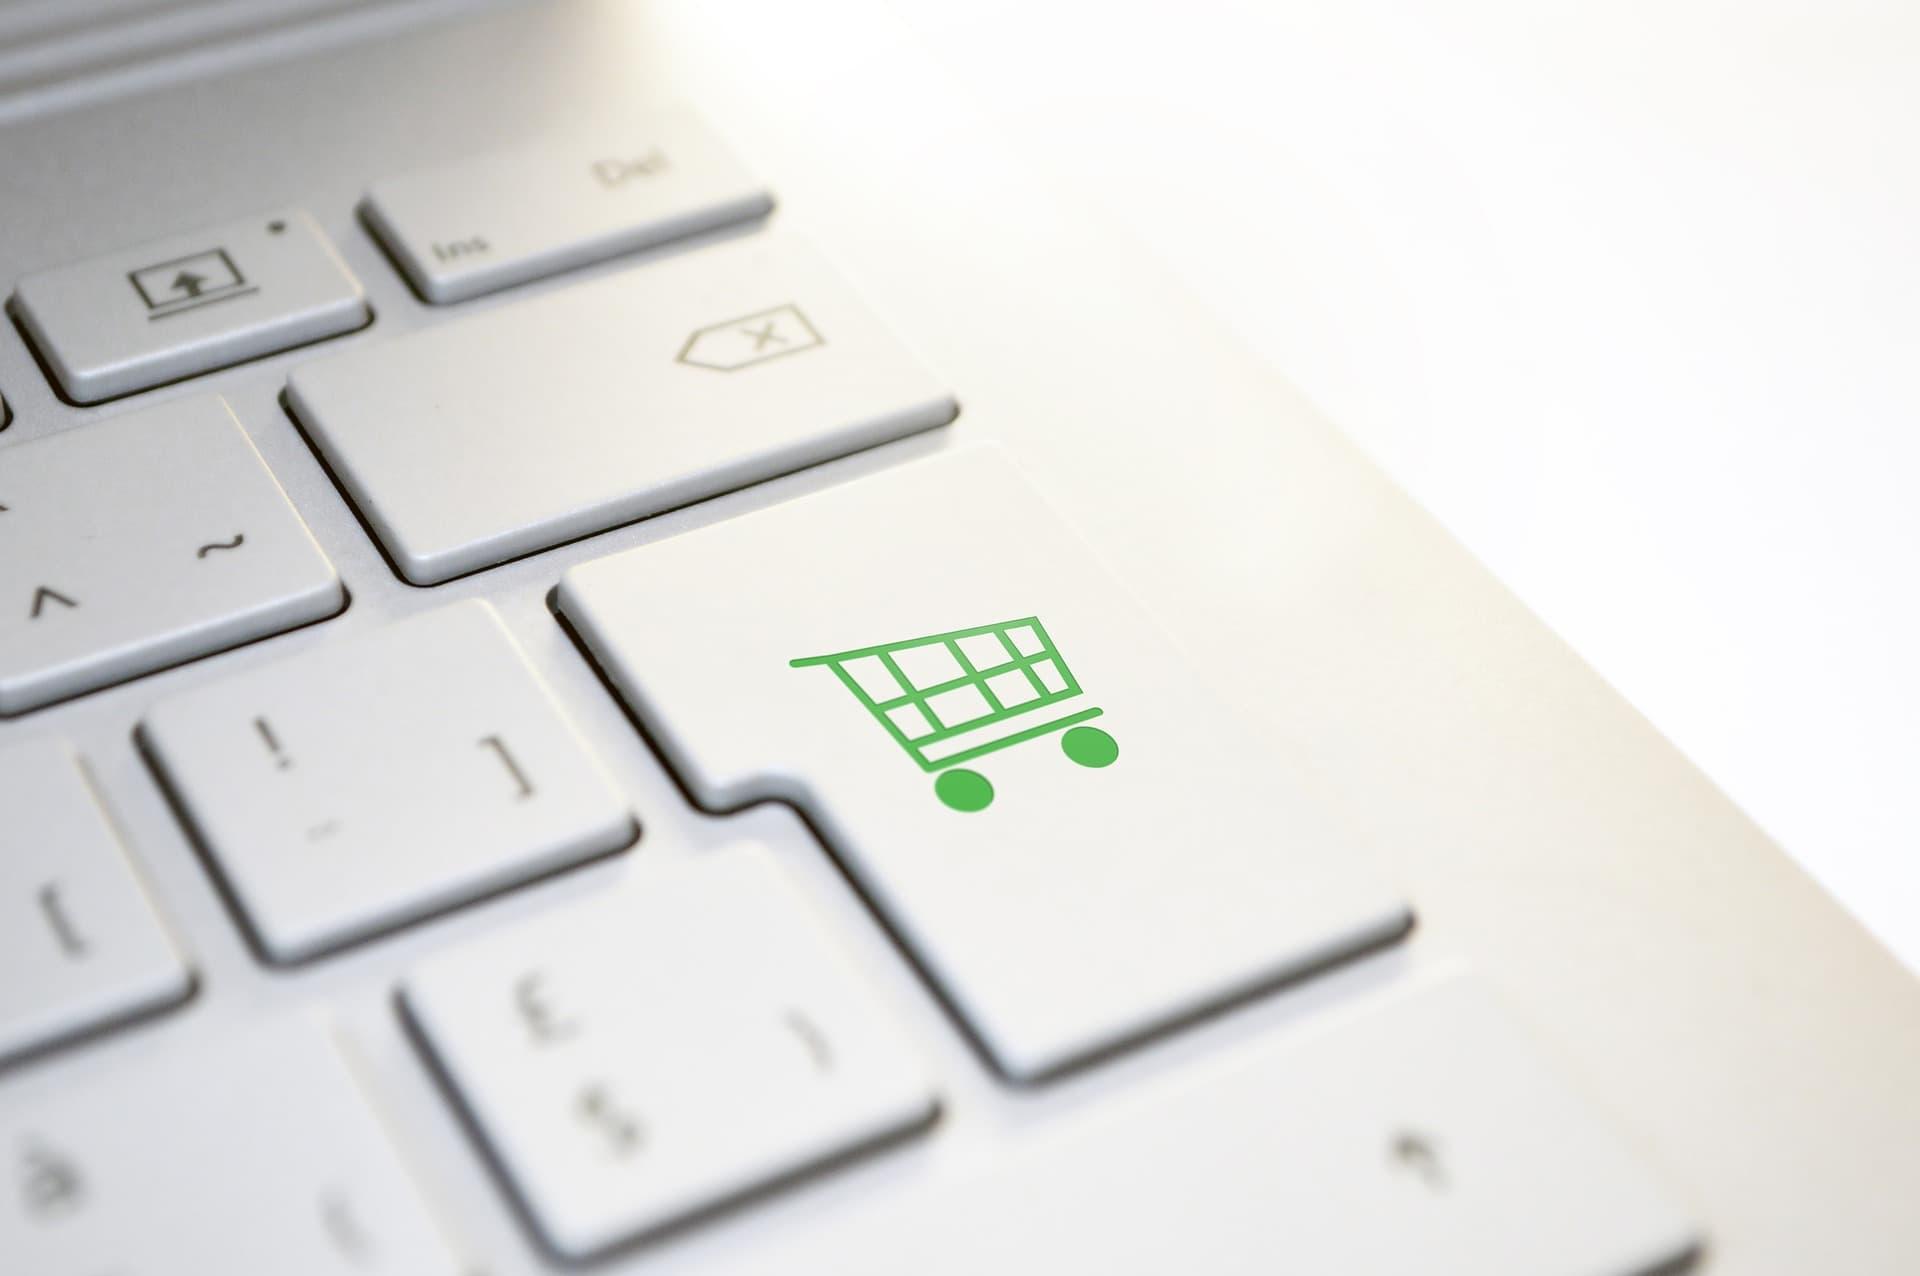 E-commerce is a real environmental culprit